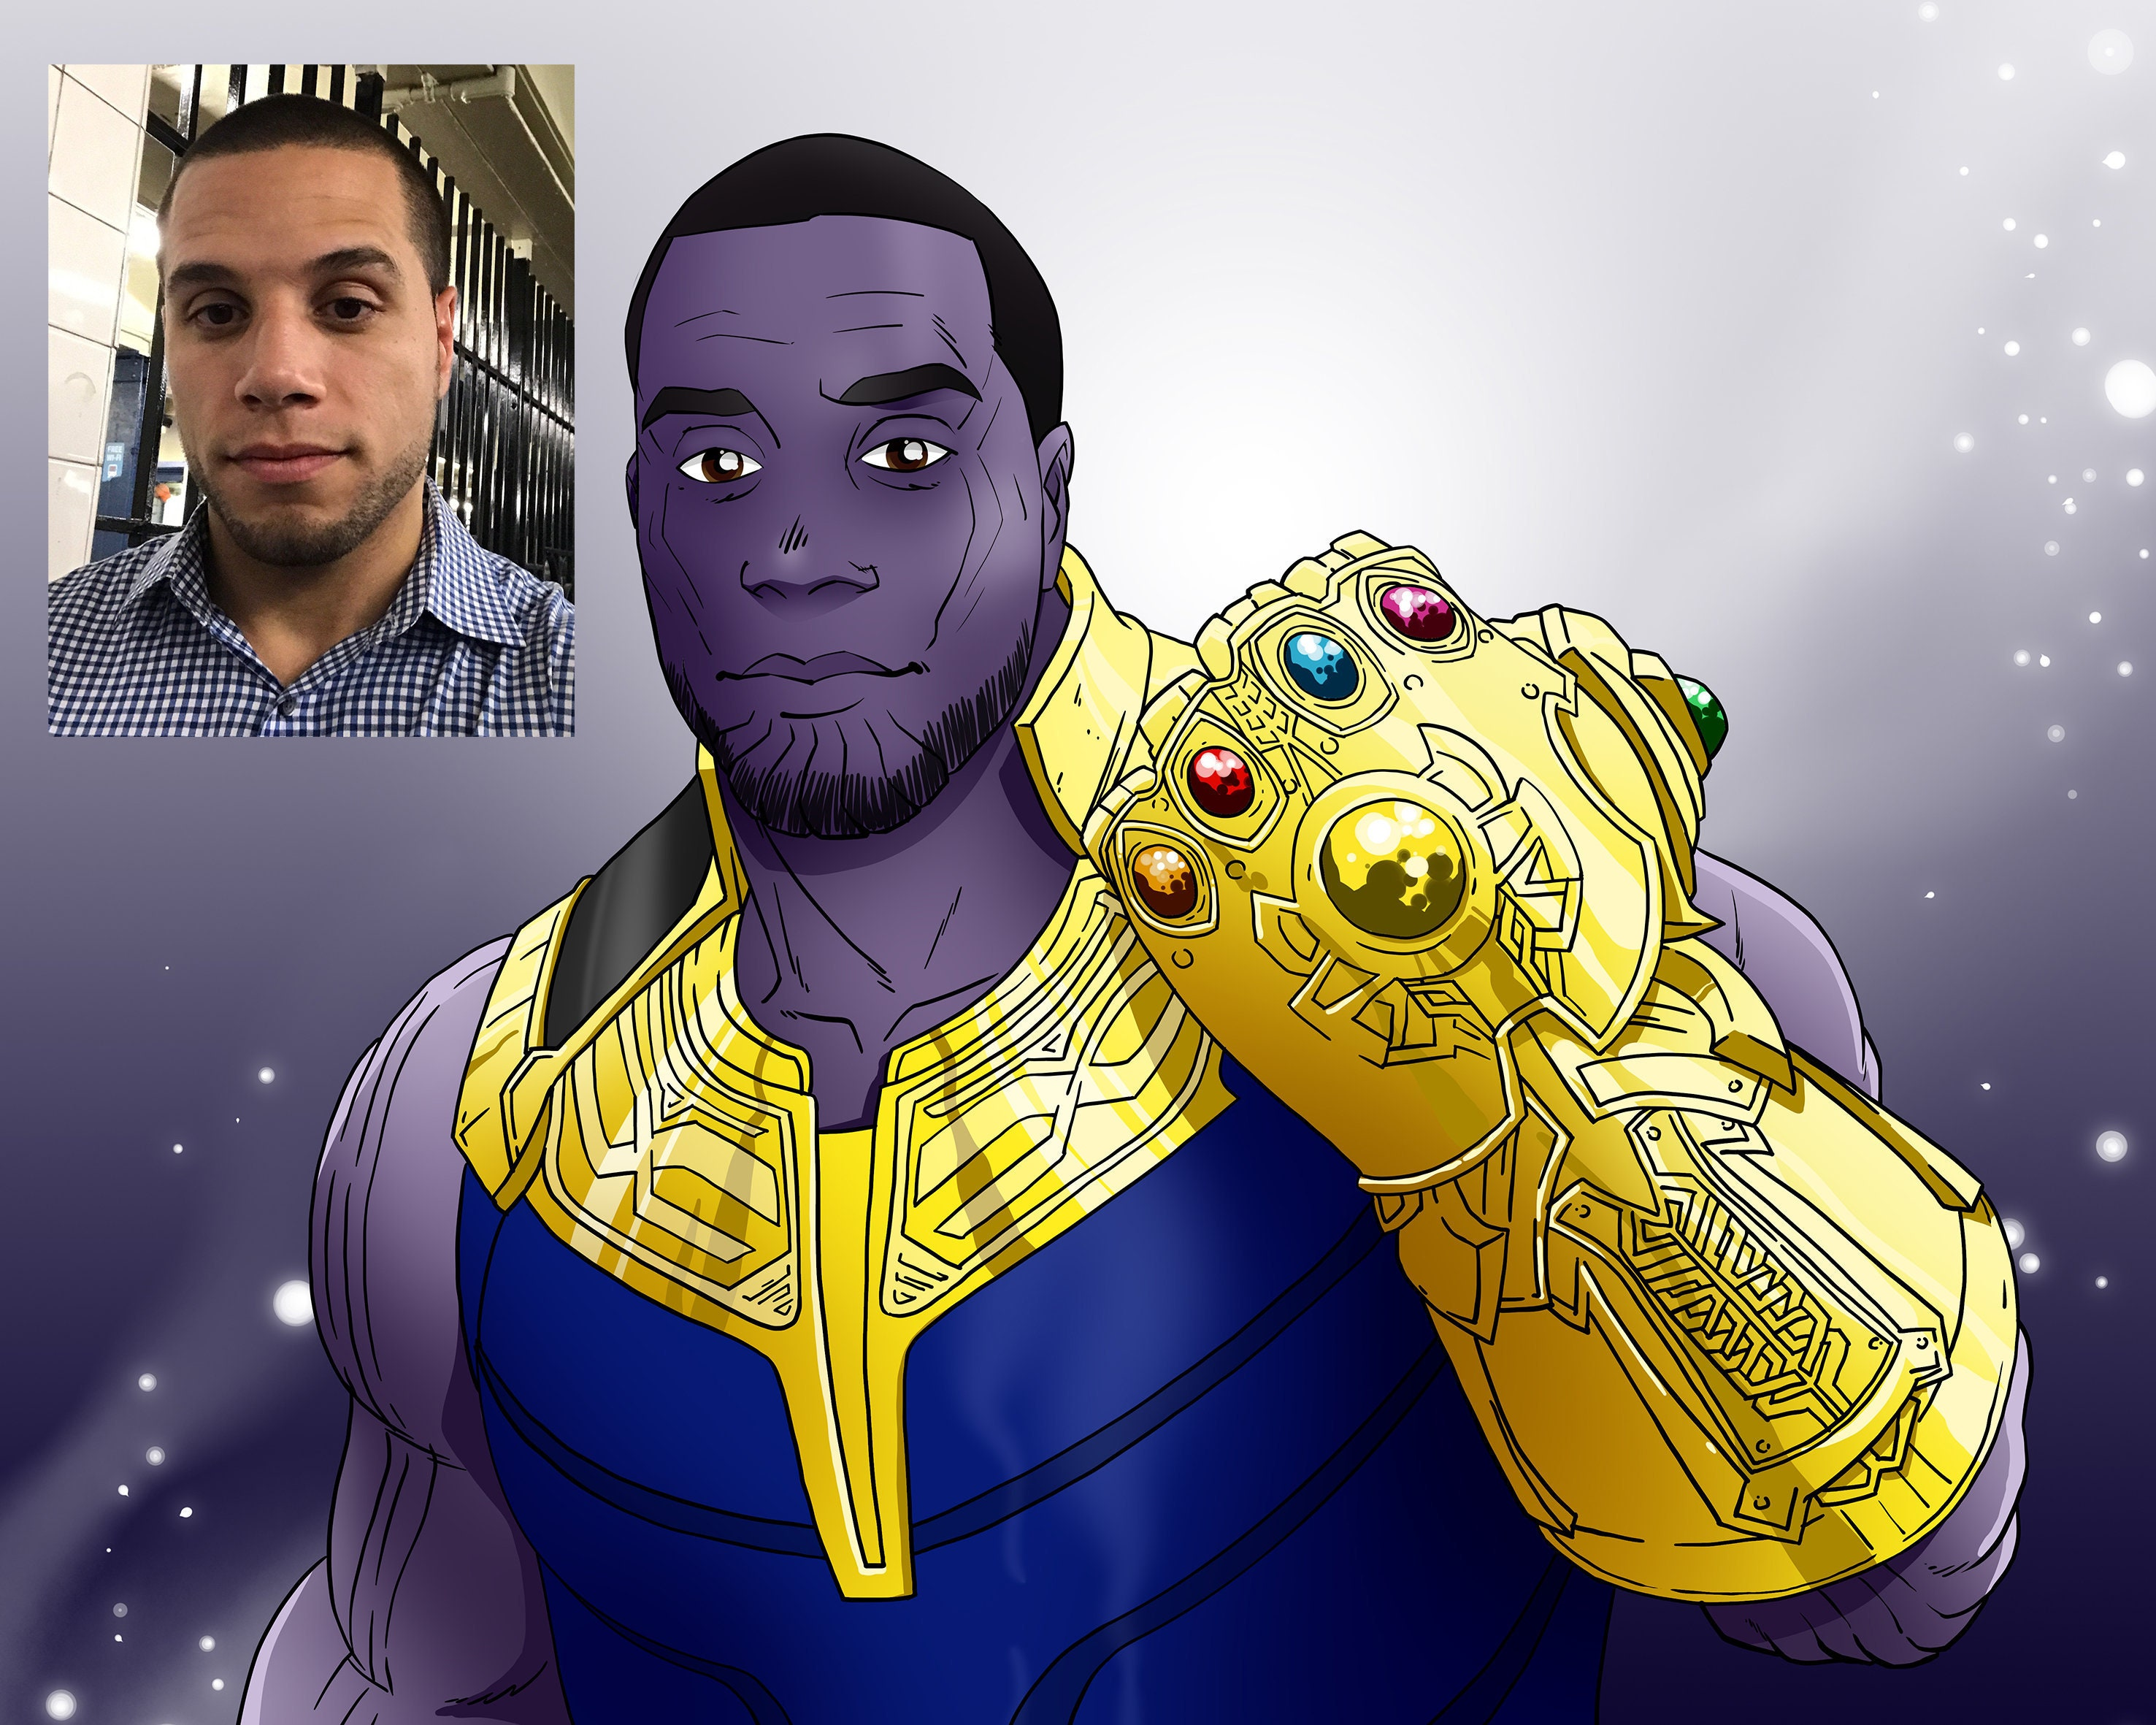 You as Thanos - Personalisiertes Cartoon-Superheld-Portrait, Thanos-Poster, Thanos-Kunst, individuelle Karikatur.